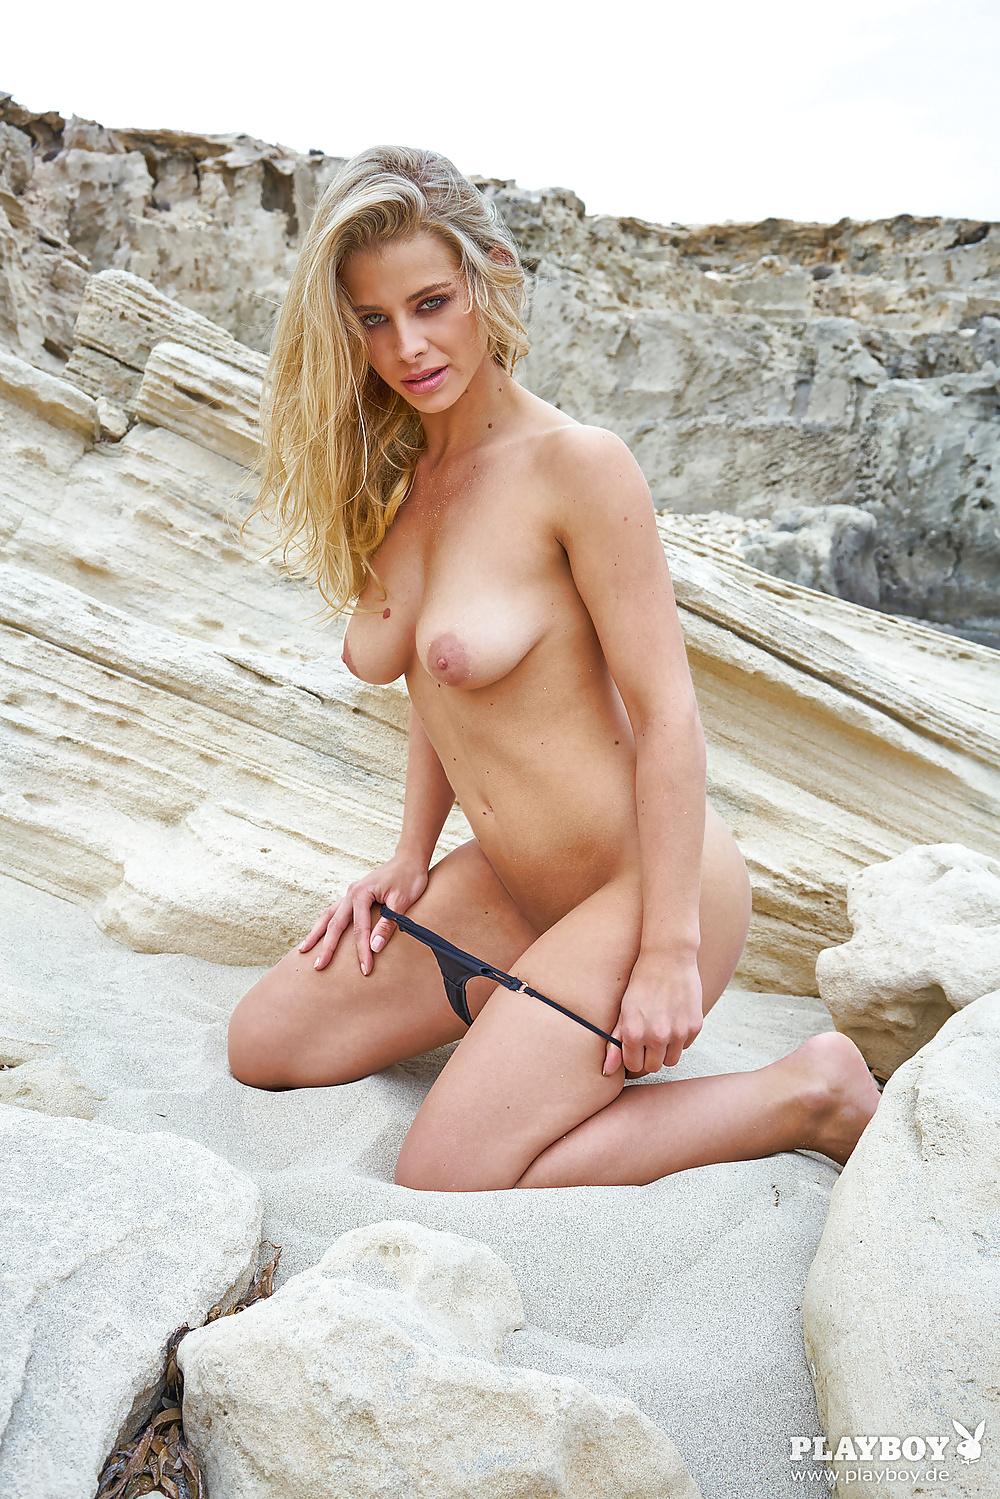 Playboy nackt im saskia atzerodt Sexy